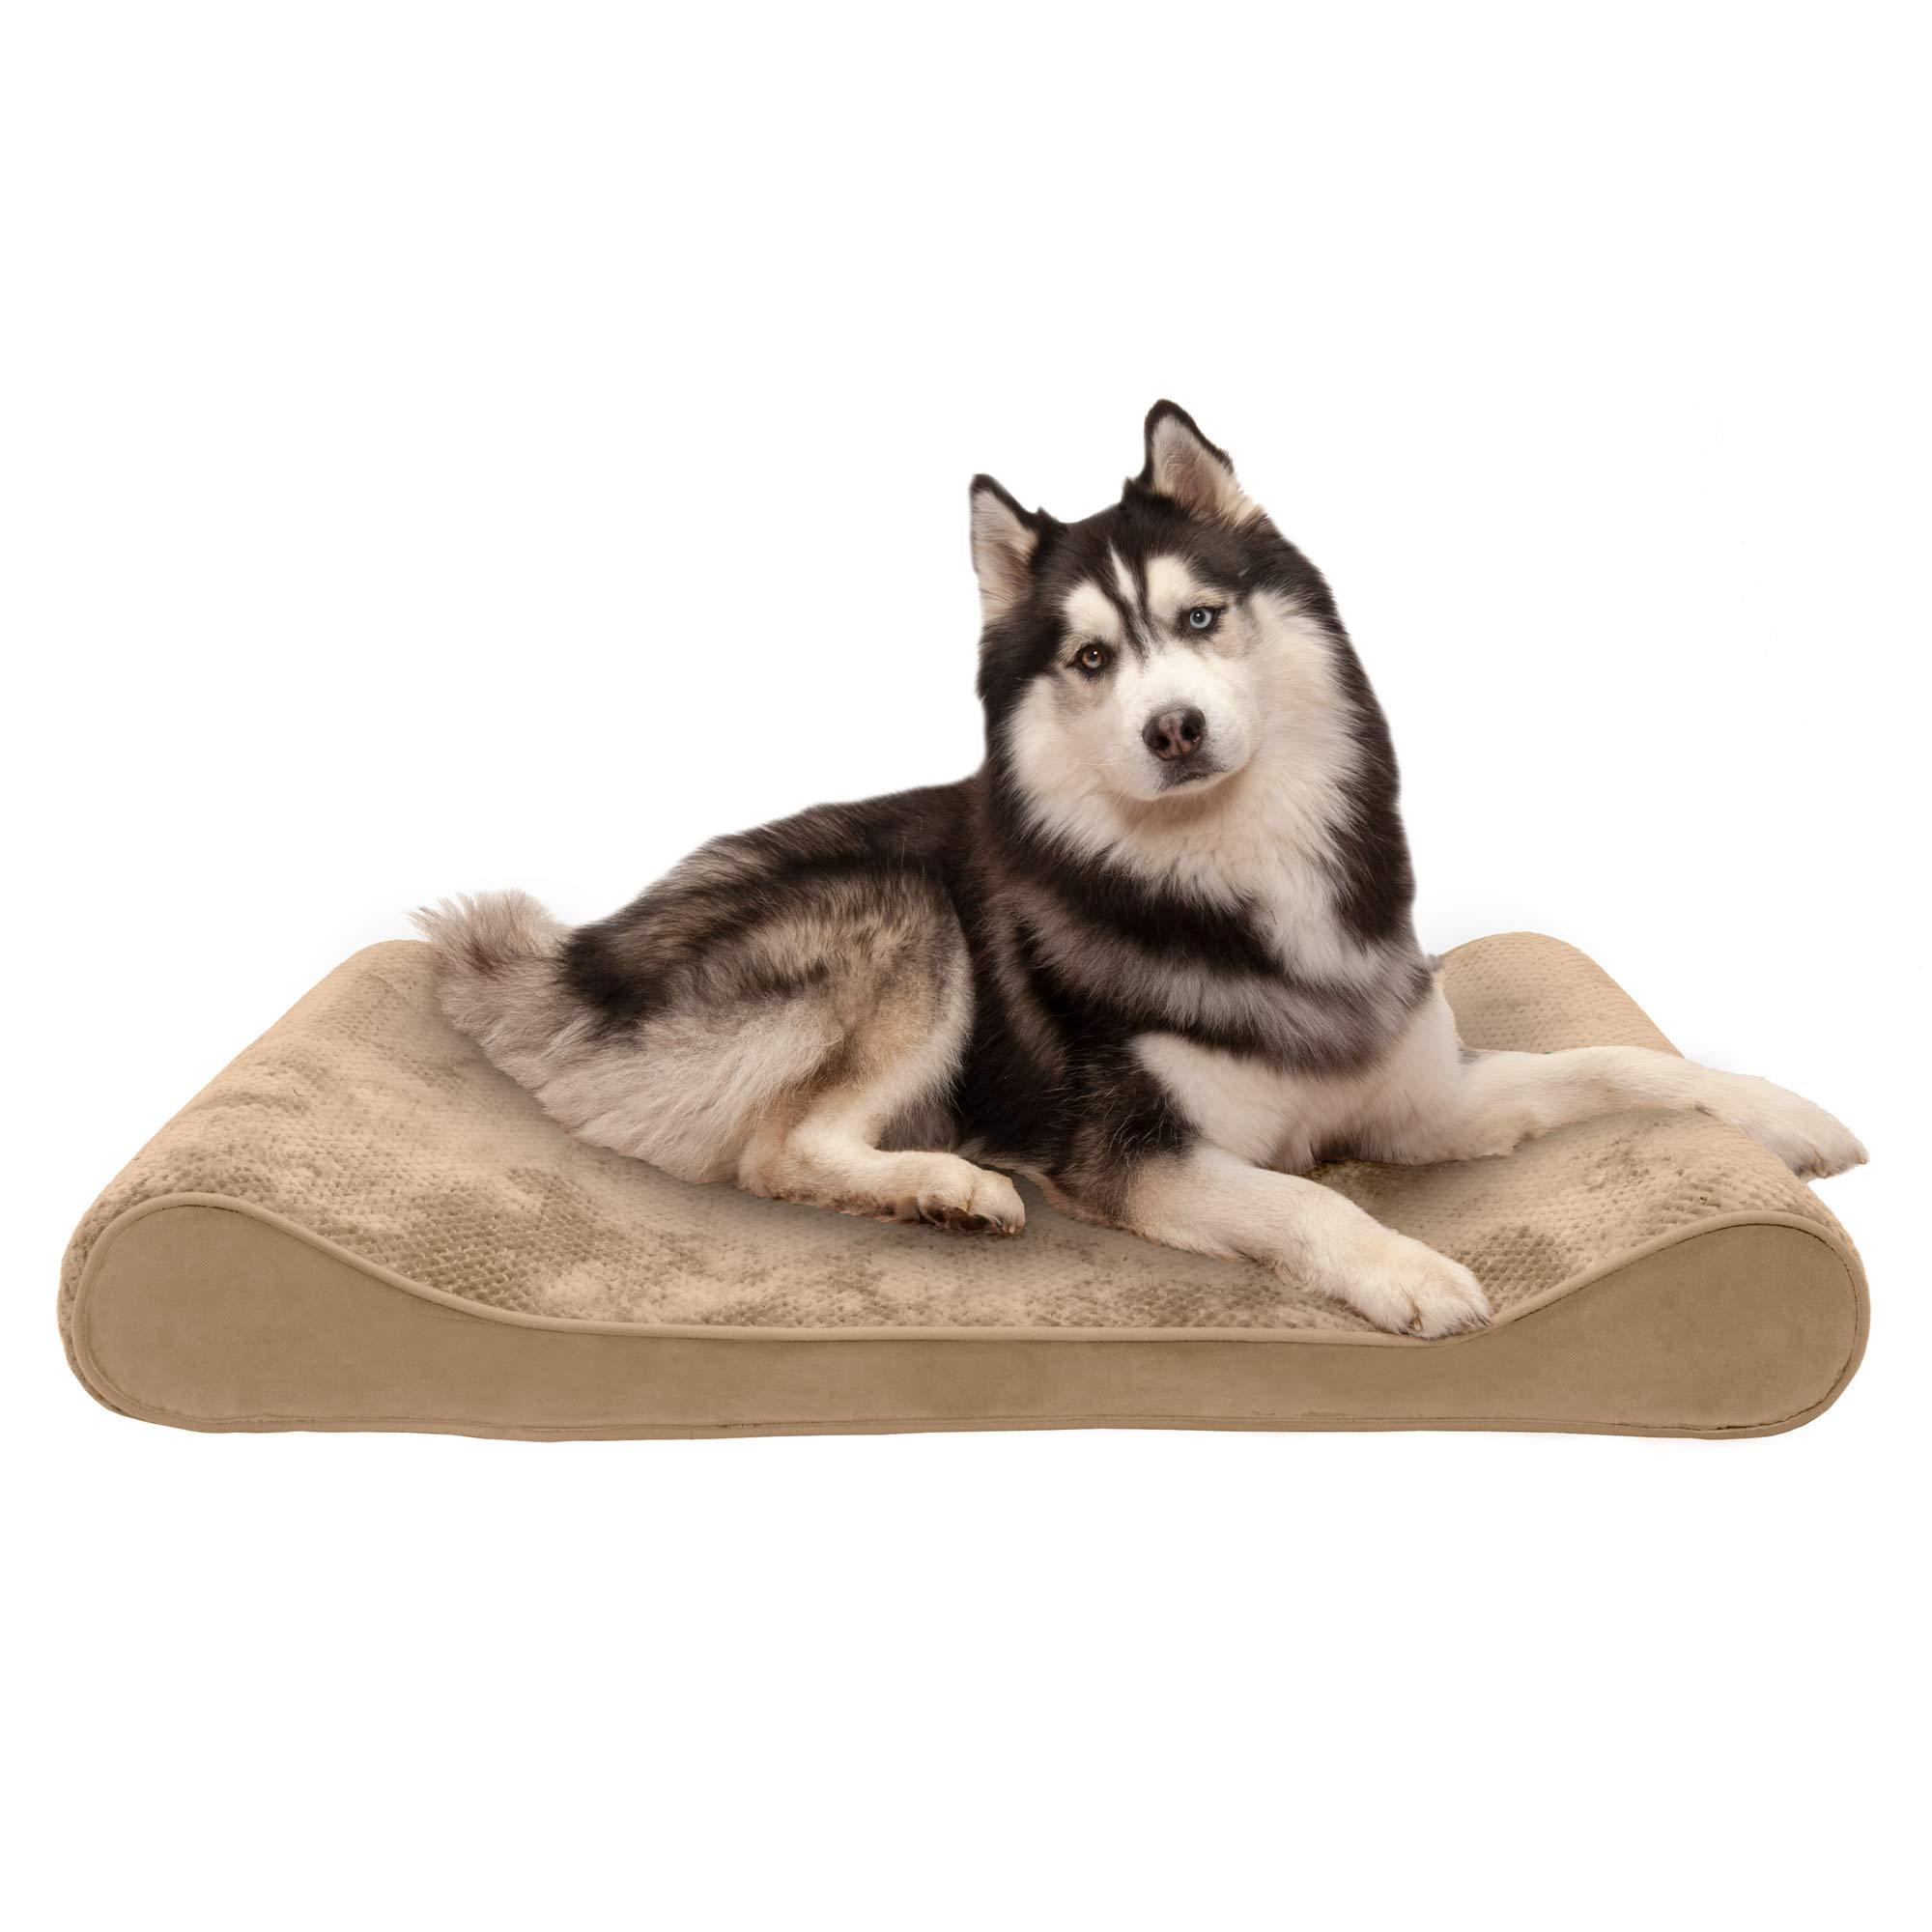 Furhaven Pet Dog Bed   Memory Foam Minky Plush & Velvet Ergonomic Luxe Lounger Cradle Mattress Contour Pet Bed w/ Removable Cover for Dogs & Cats, Camel, Jumbo